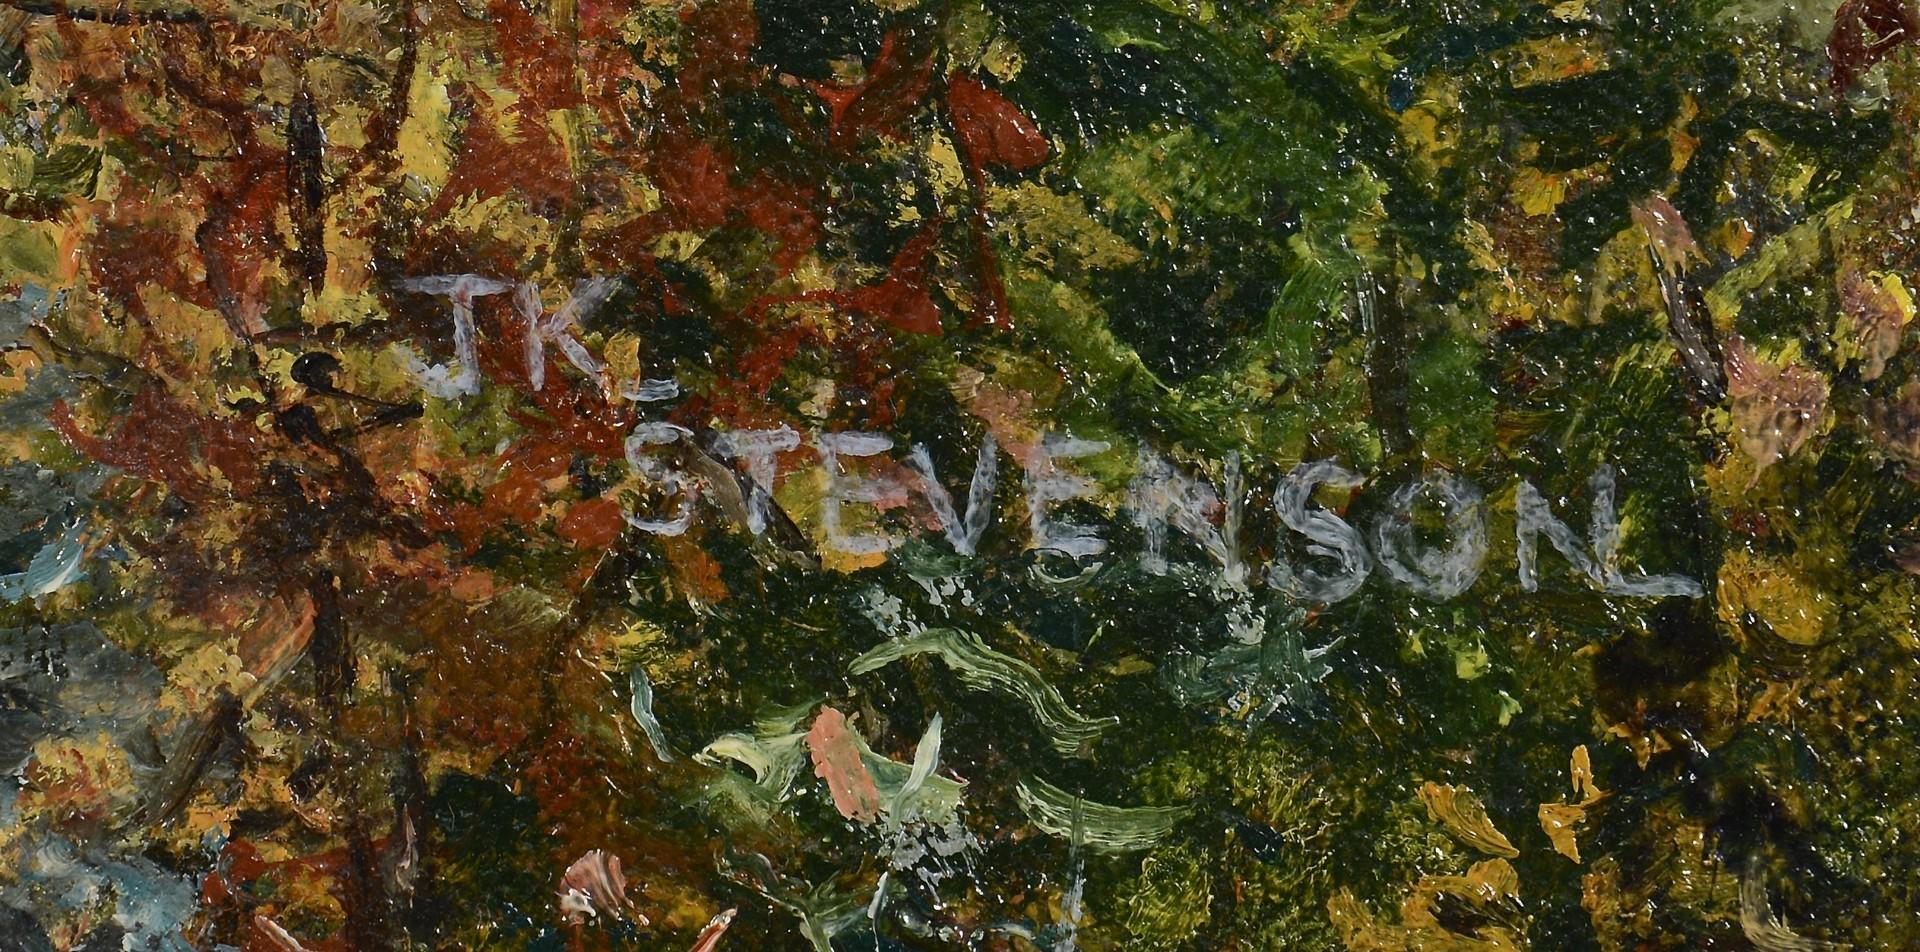 Lot 555: Fall Mountain Landscape, J.K. Stevenson